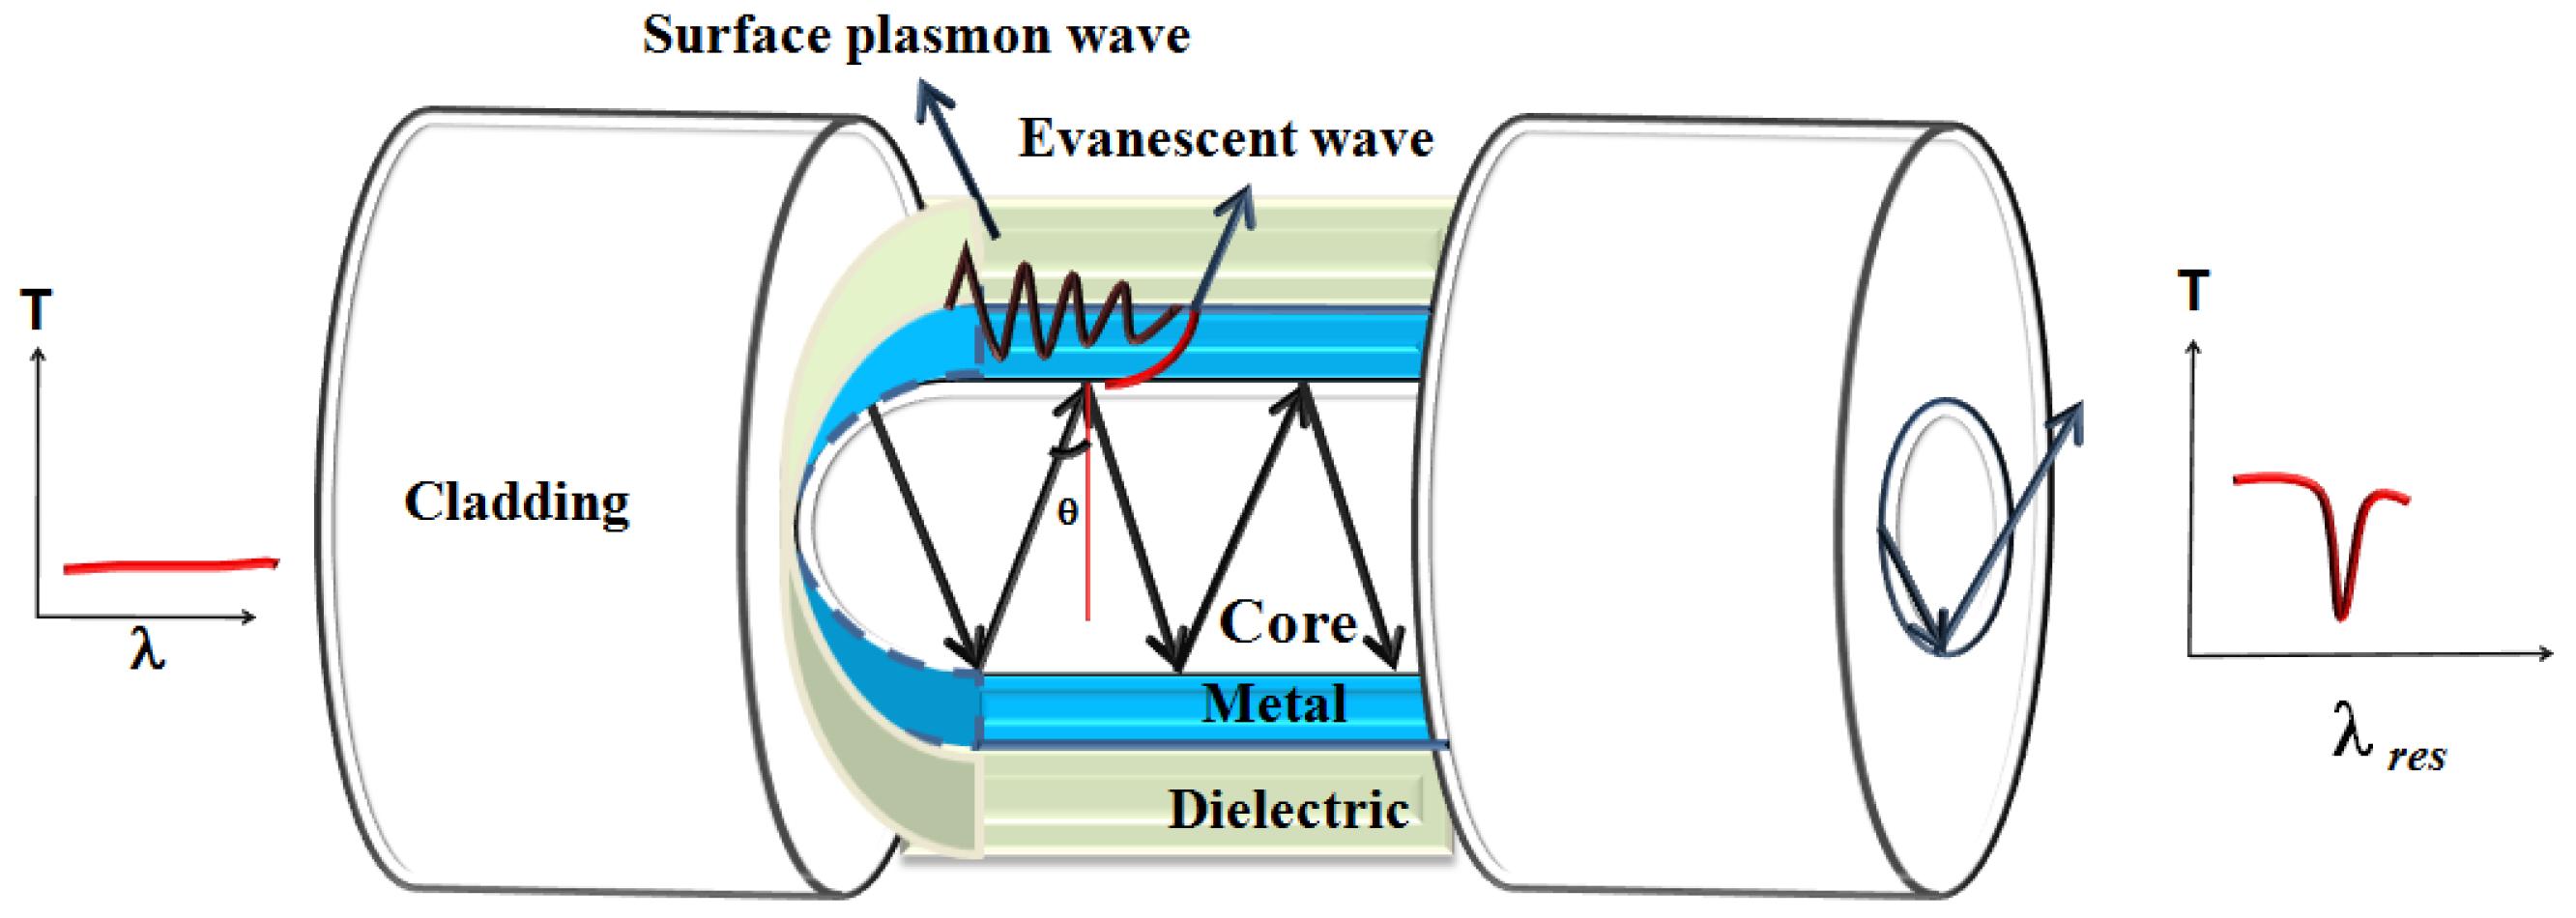 Sensors Free Full Text Surface Plasmon Resonance Based Fiber Opto 22 Ssr Wiring Diagram 16 01381 G002